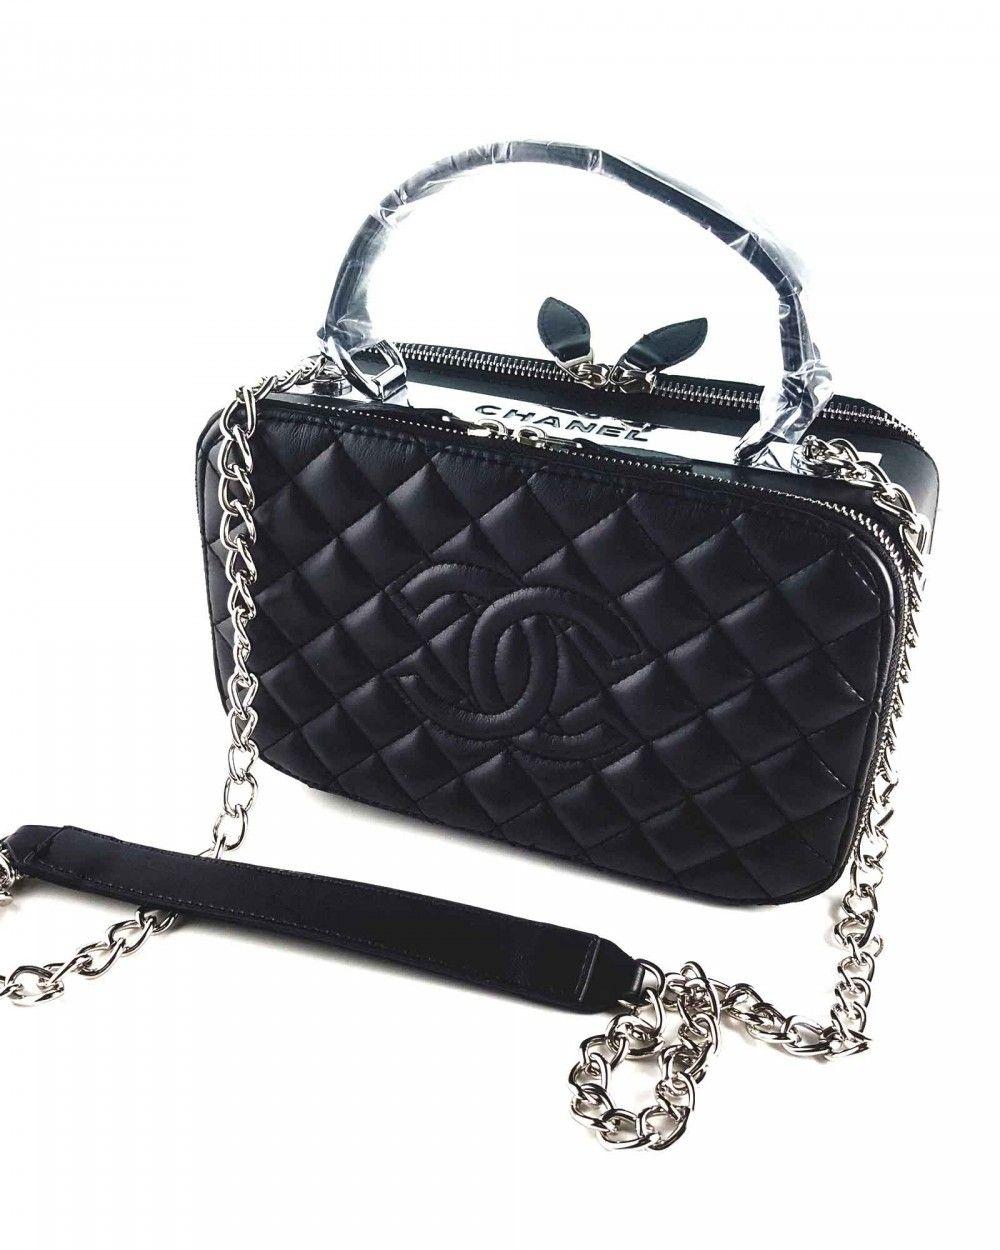 Chanel Baklava Desen Kutu Zincir Aski Canta Siyah Chanel Canta Capraz Canta